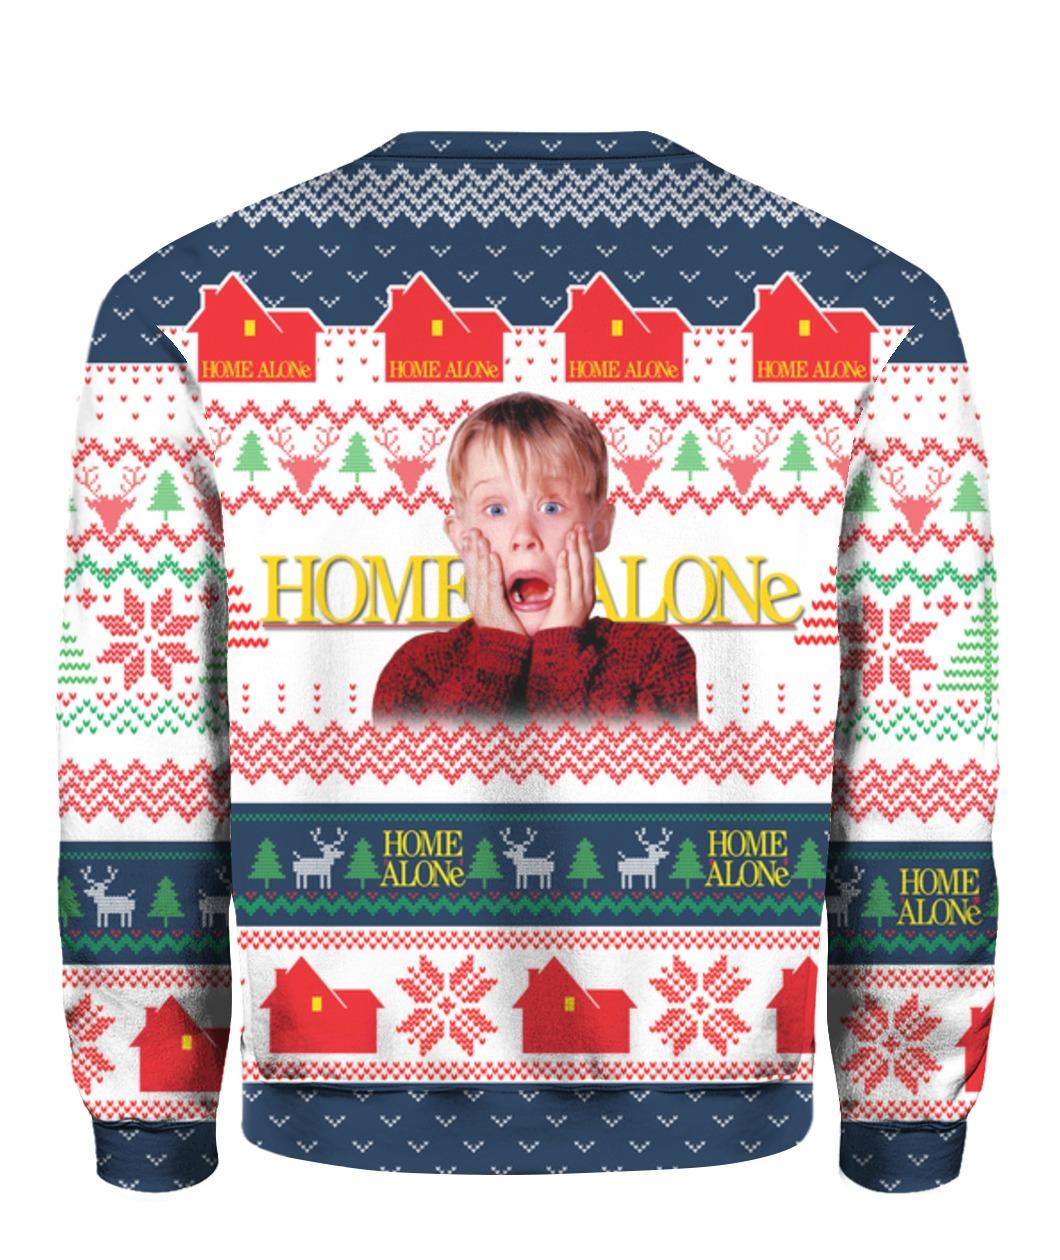 Home alone merry christmas ya filthy animal ugly christmas sweater - maria